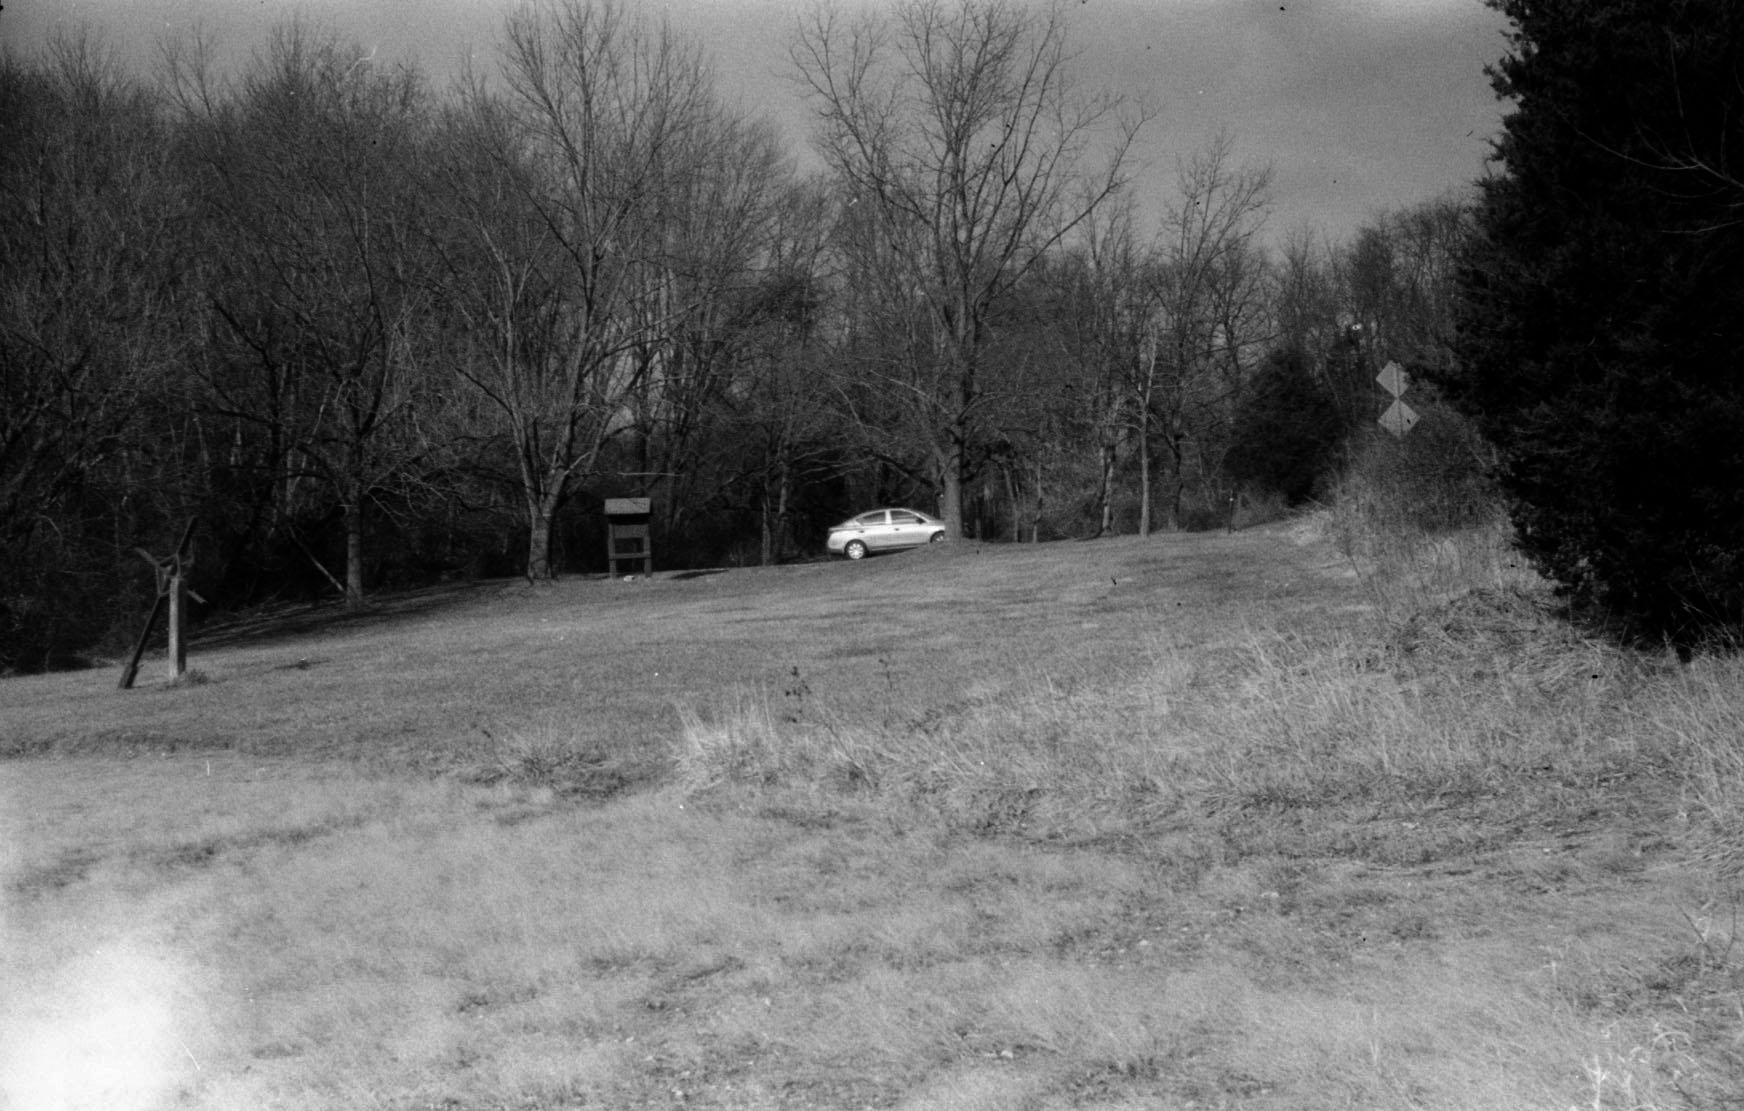 distant_car.jpg